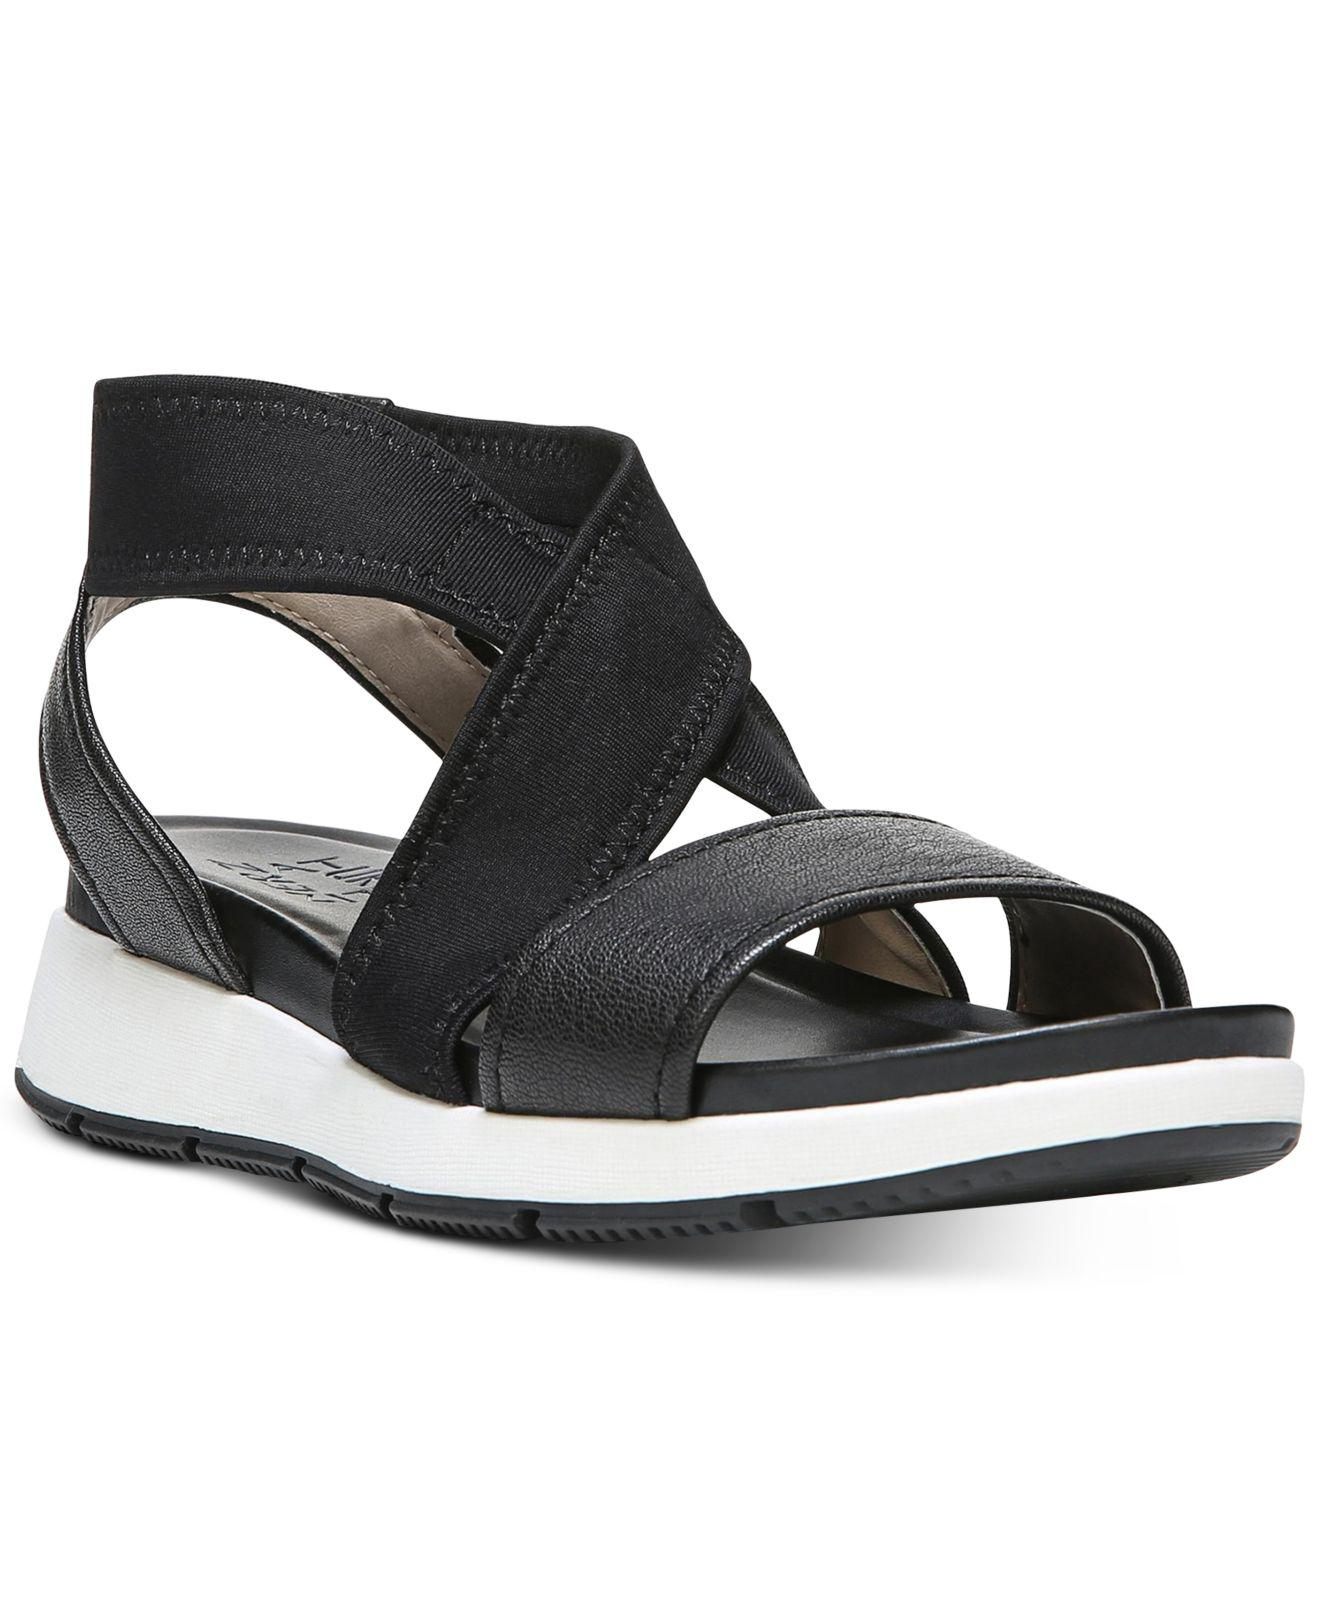 8bbc4db1b884ce Lyst - Naturalizer Layla Sandals in Black